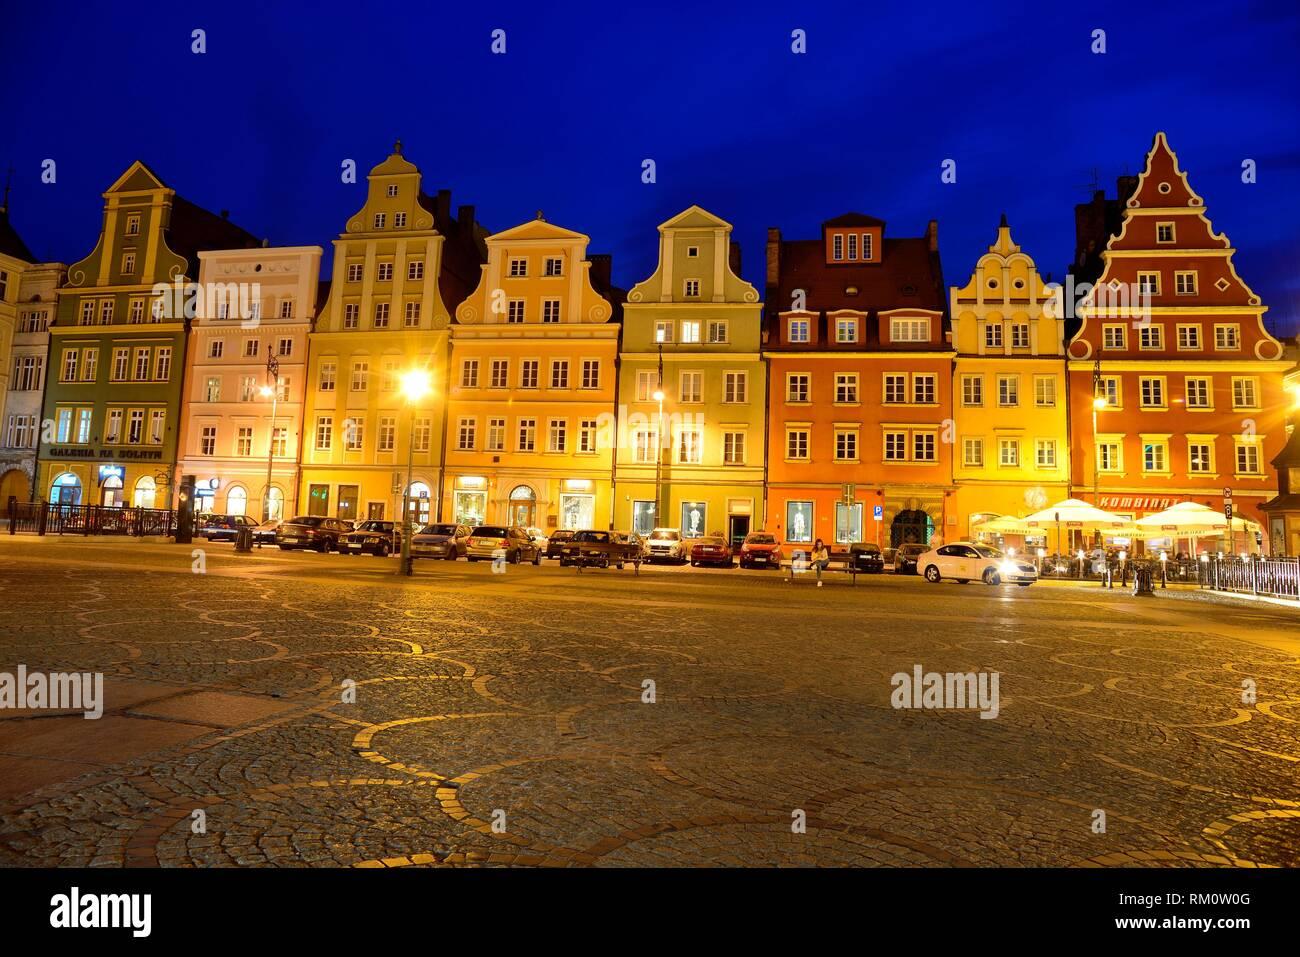 Salt square or Plac Solny, Wroclaw ''Breslau'', Poland. - Stock Image